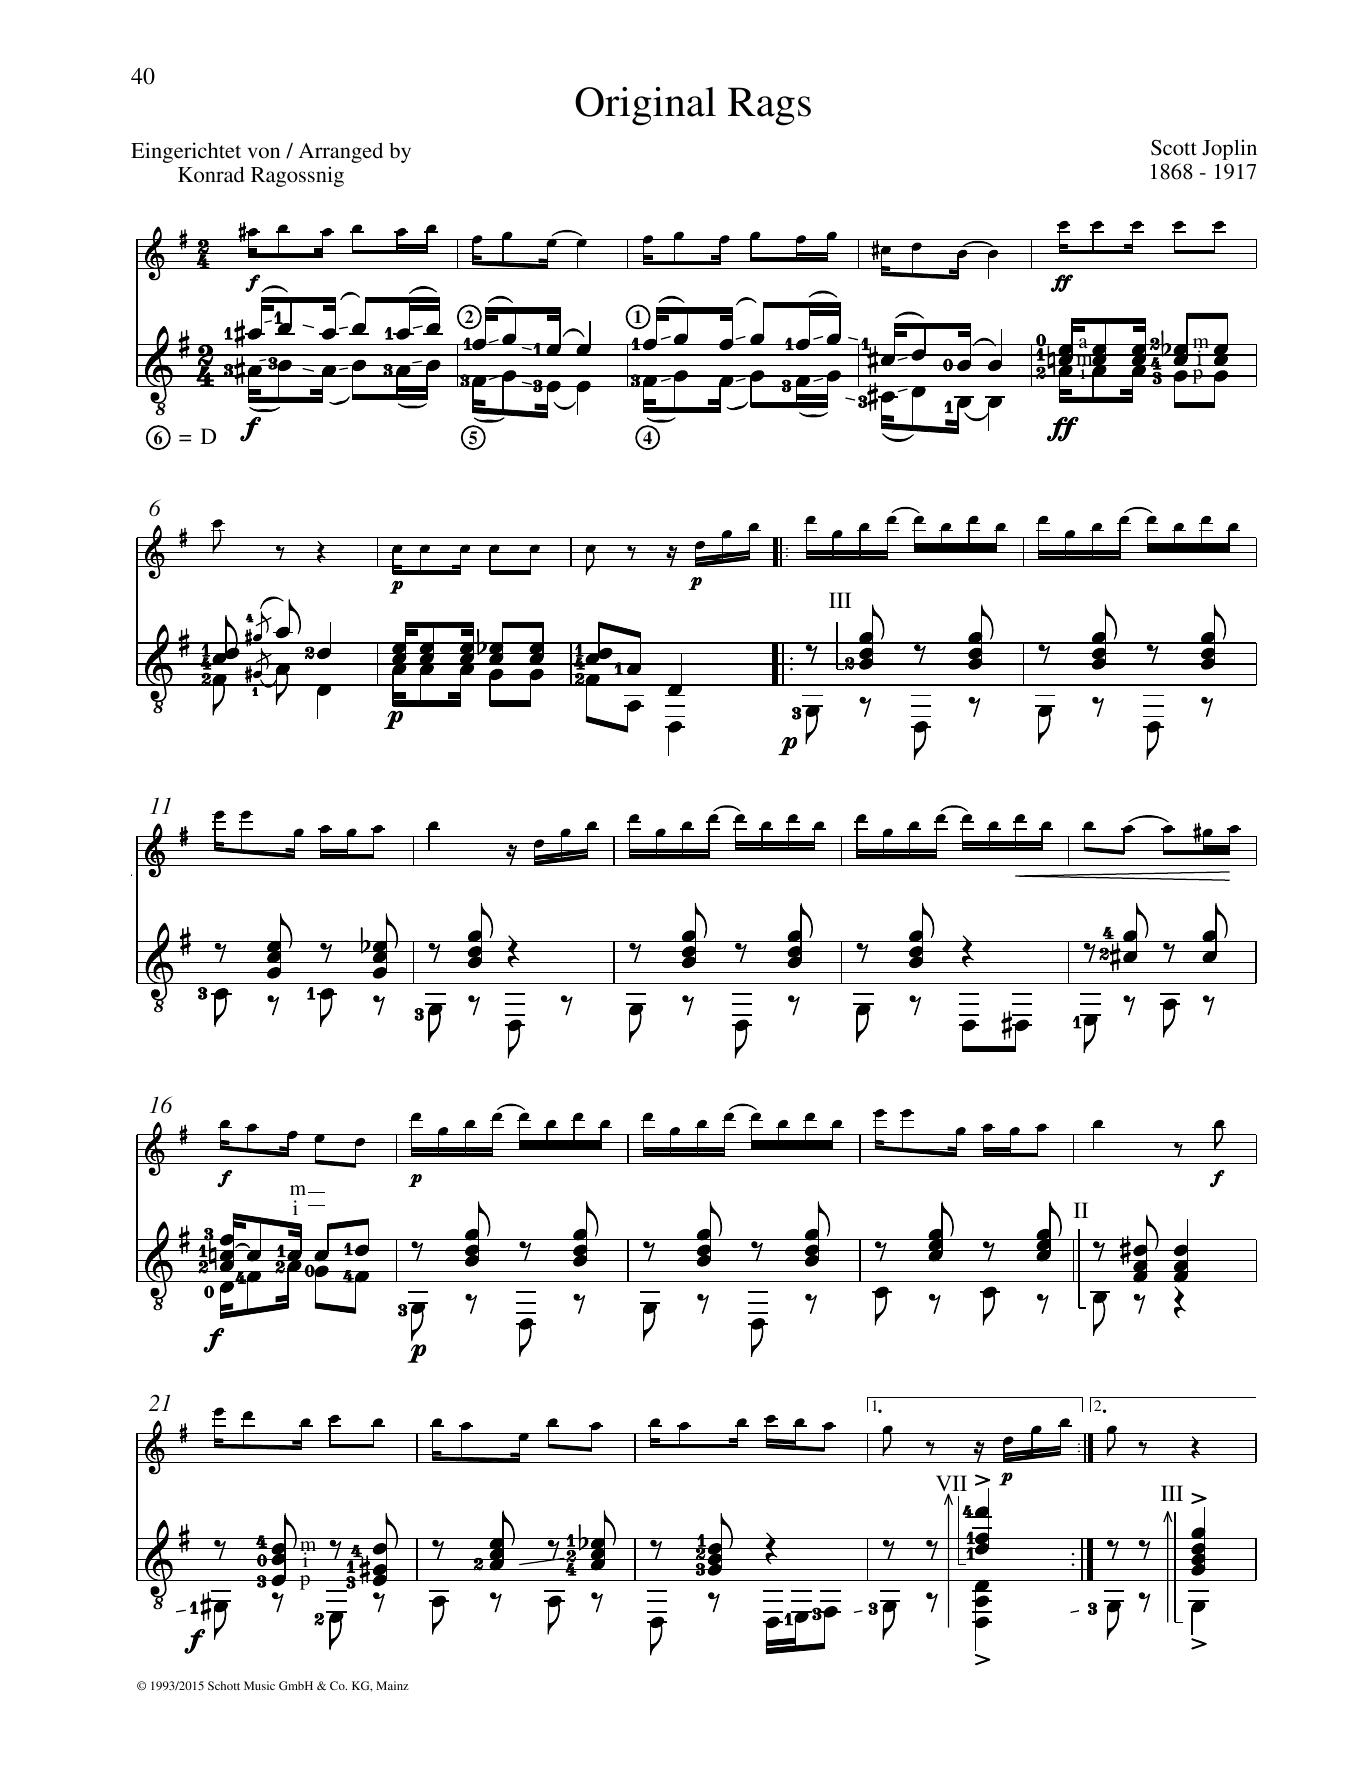 Original Rags - Full Score Sheet Music